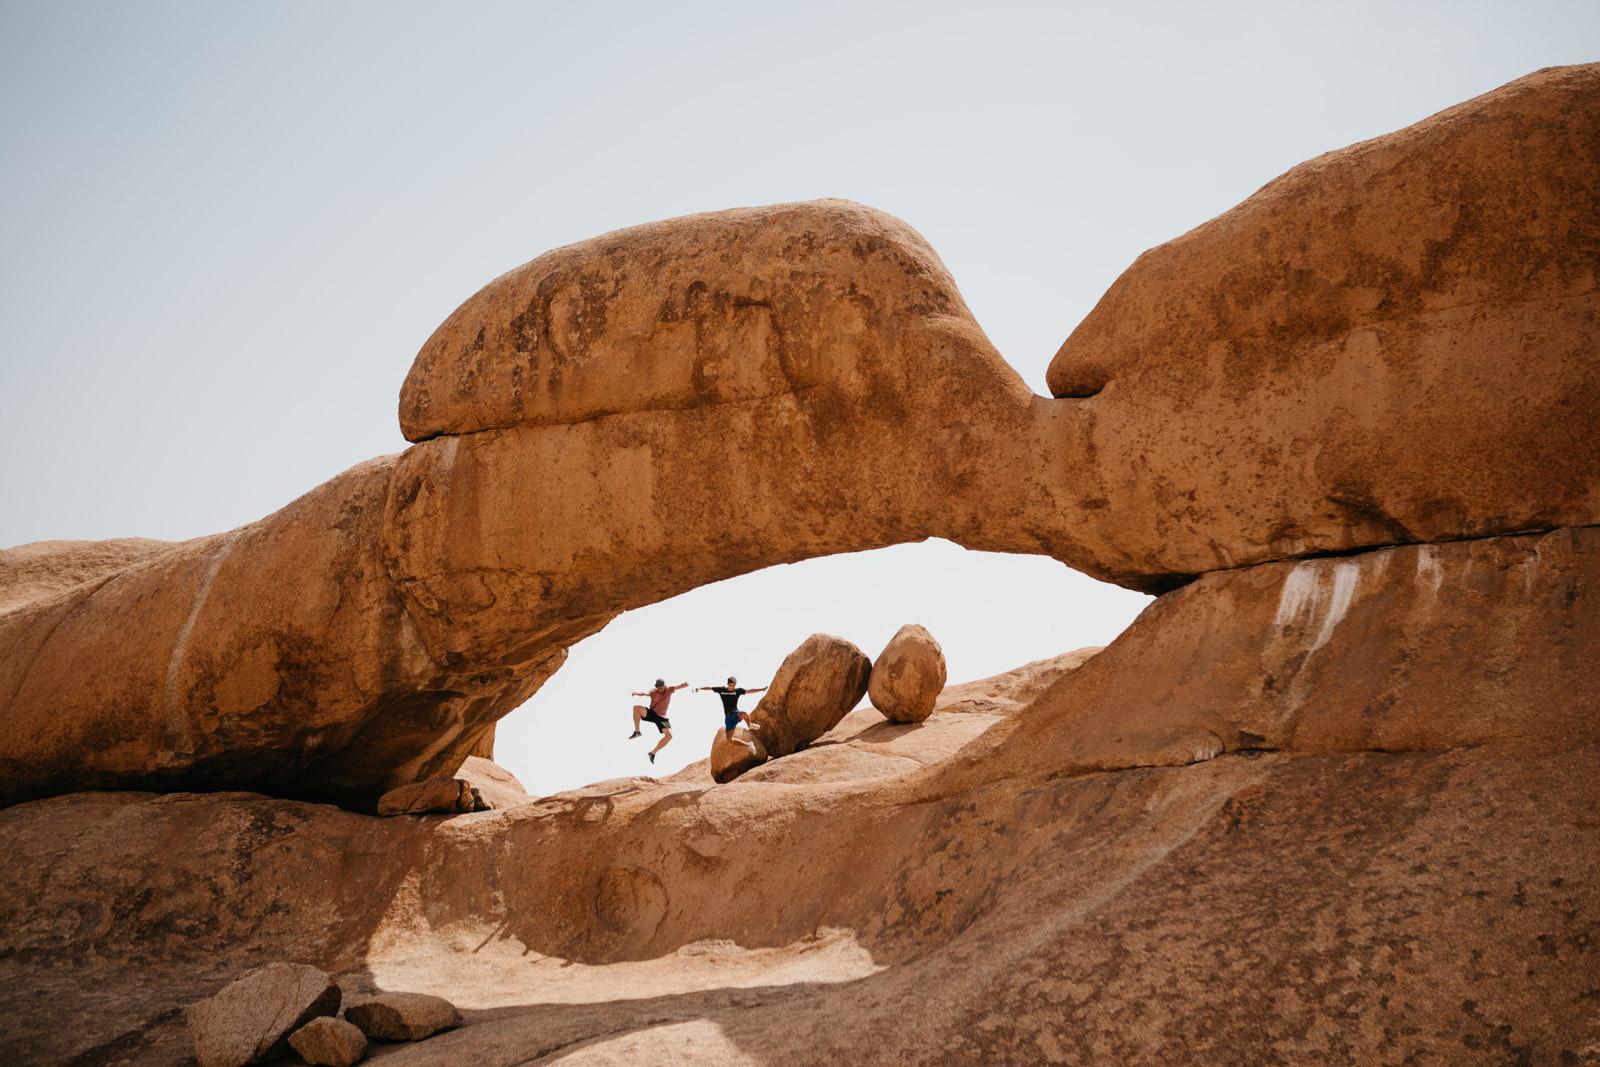 namibia_trip_rooftent_camping_roadtrip (5 von 18).jpg